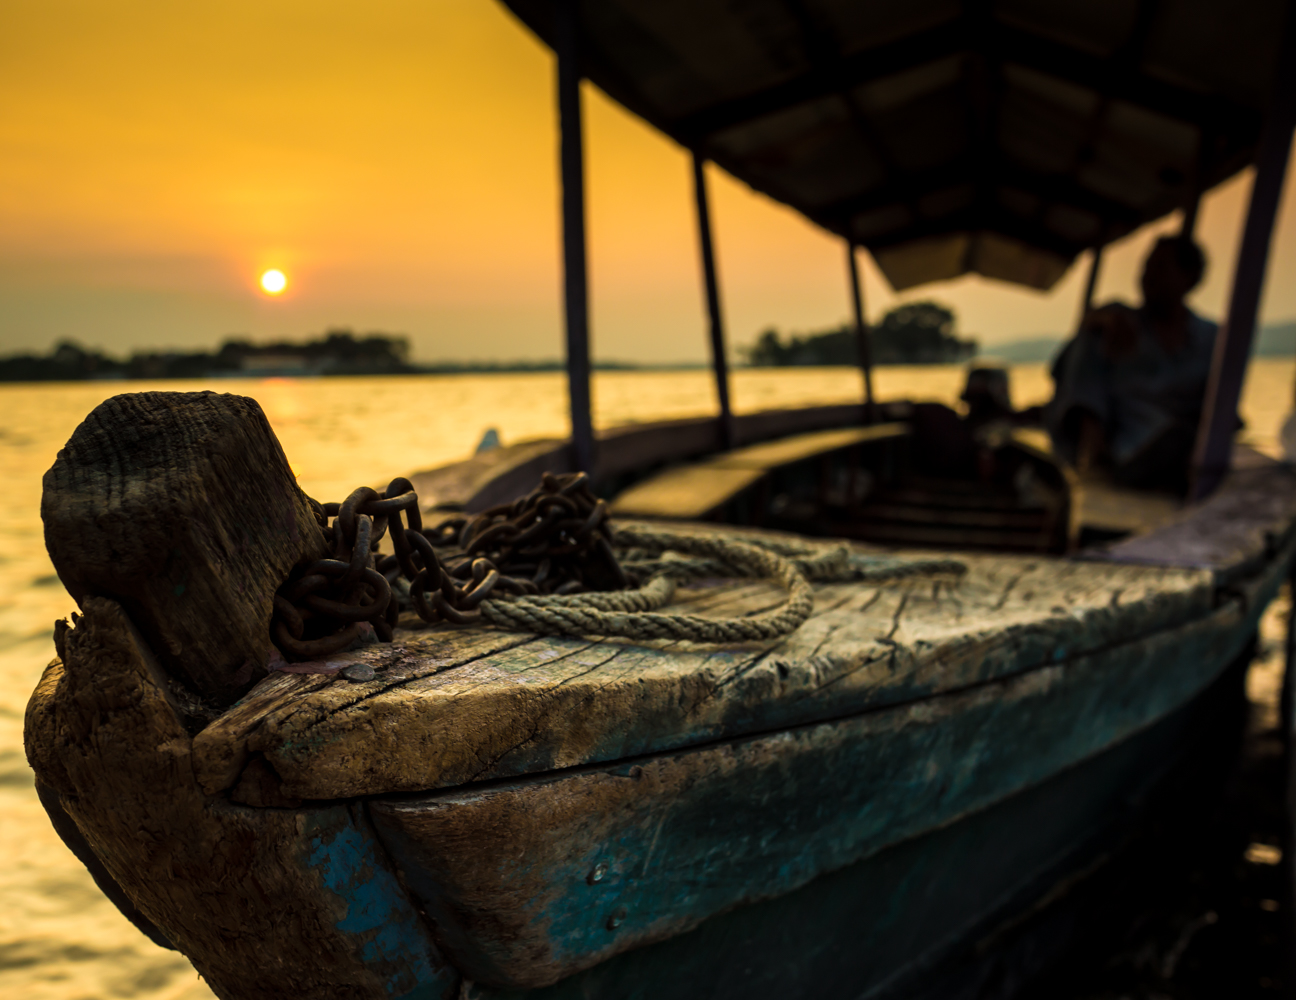 ron visser fotografie- beeldbank (2)